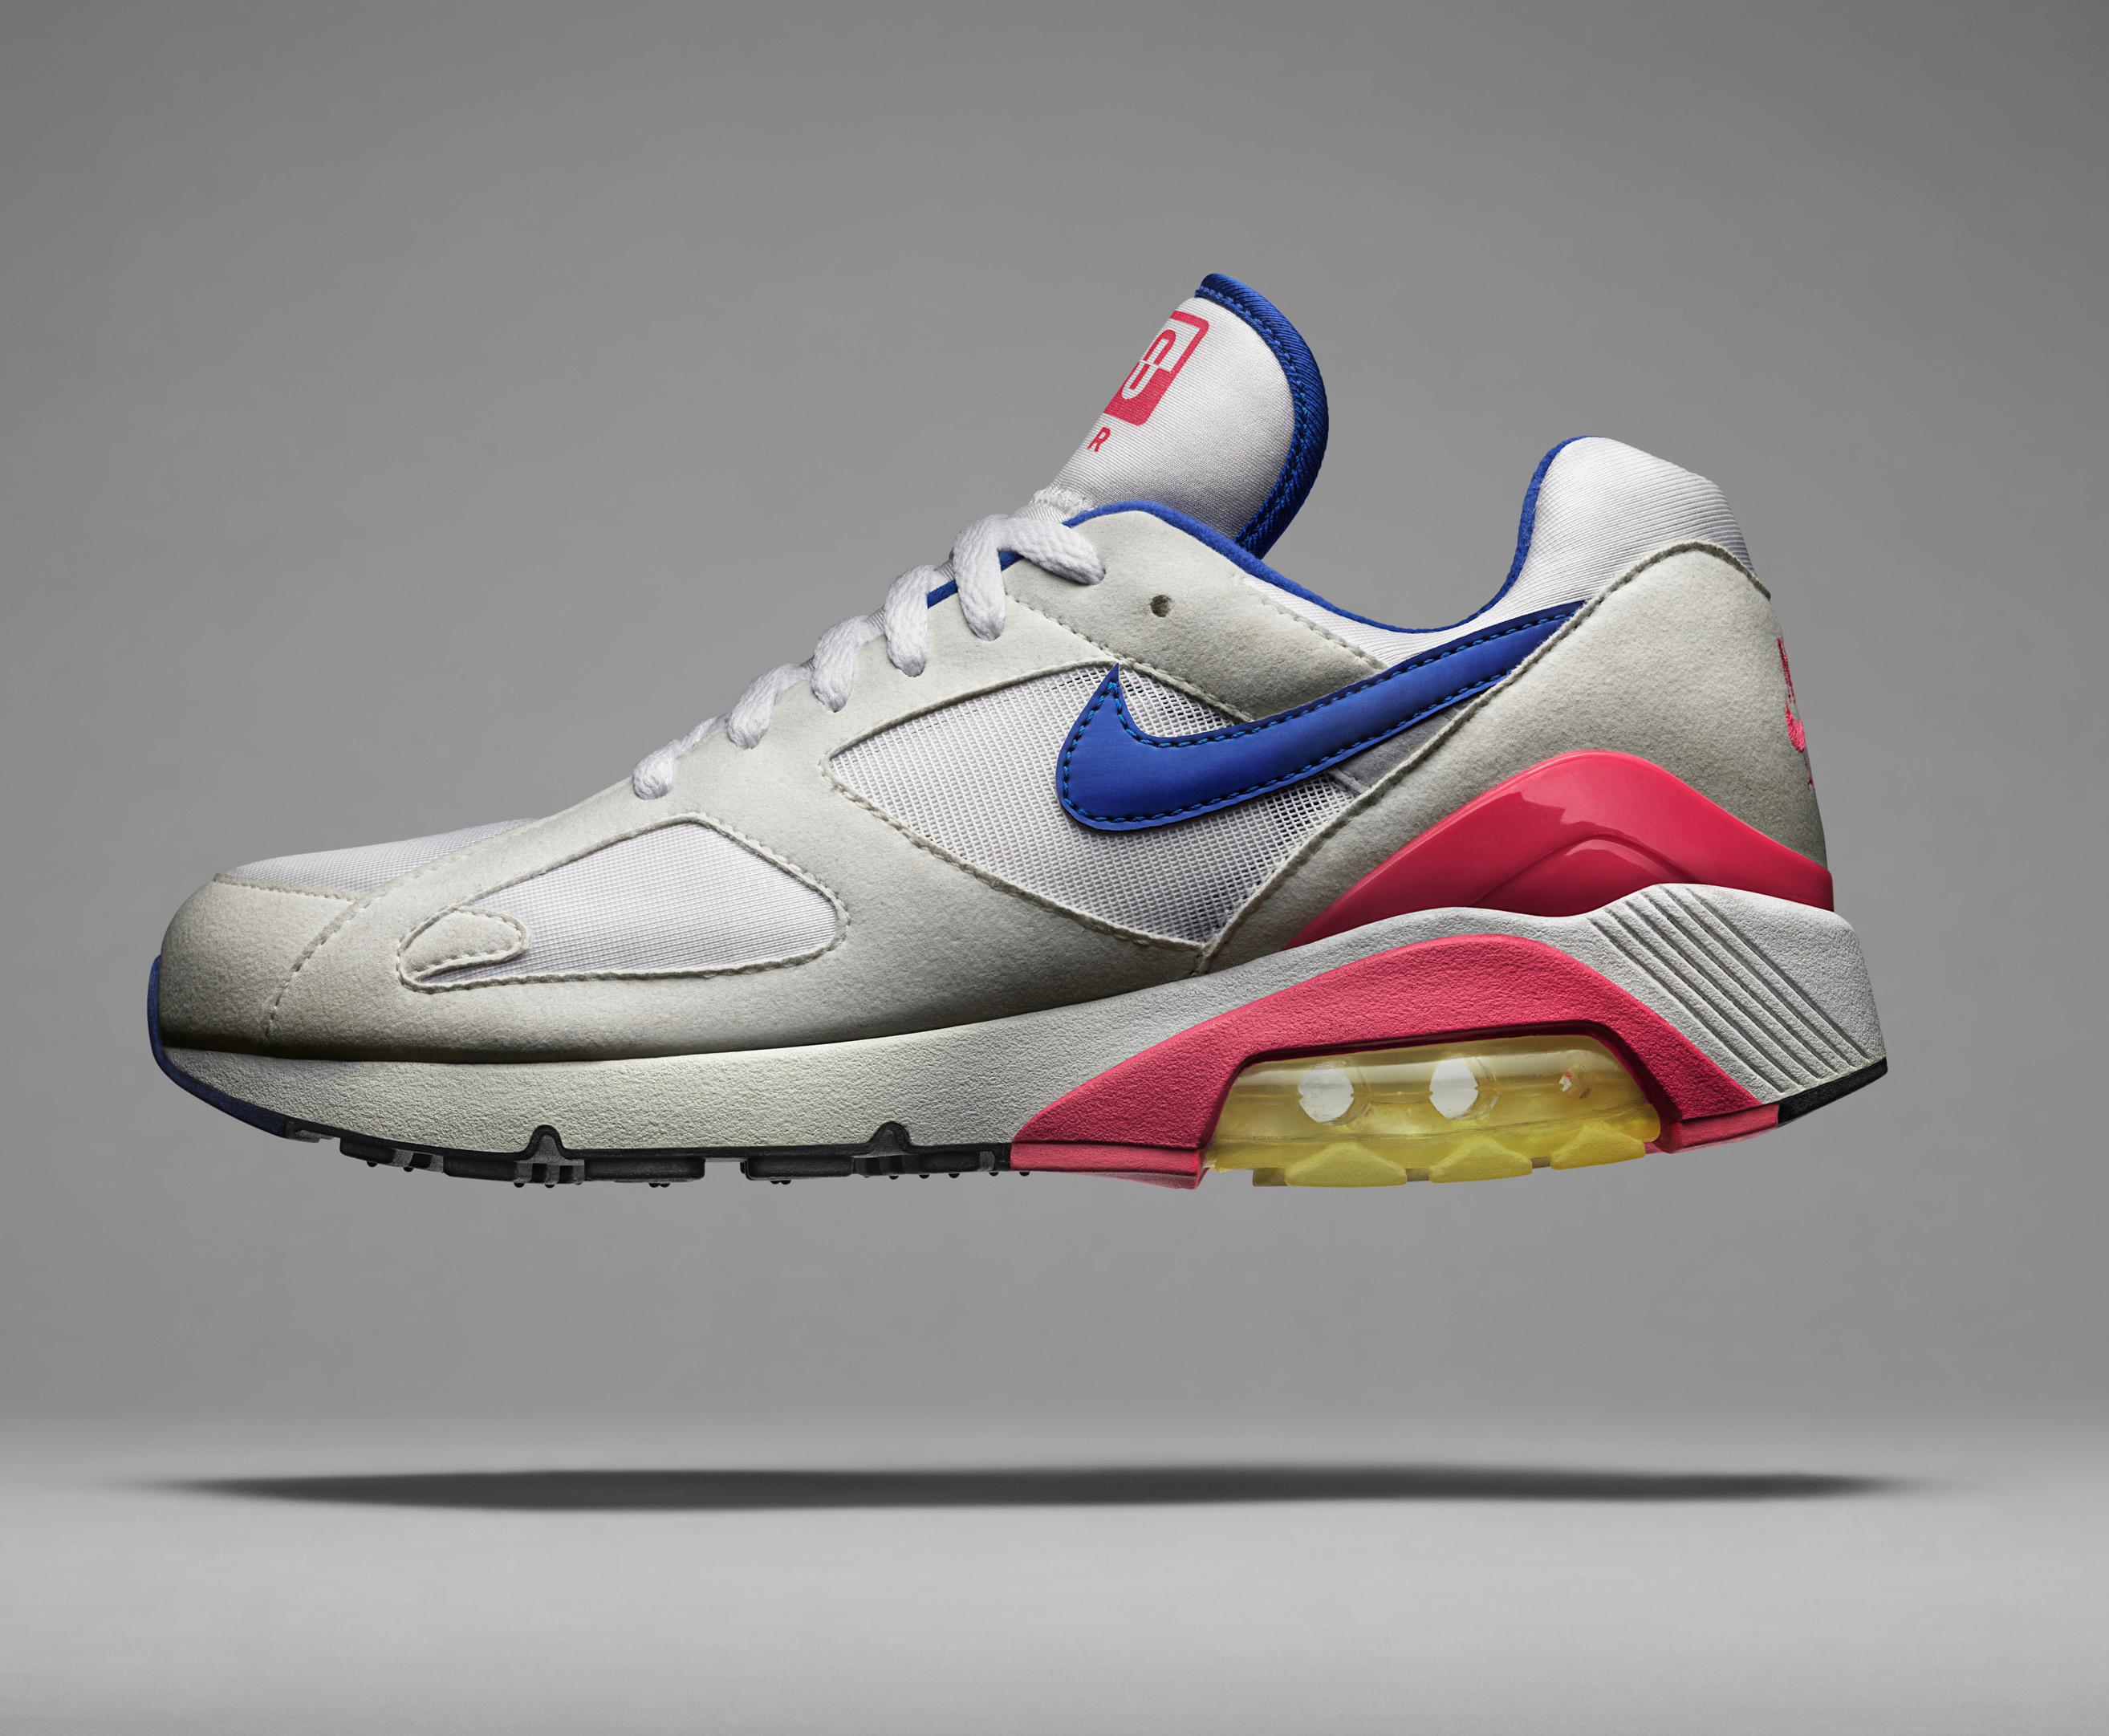 The Latest Nike Air Jordan 6 Cheap sale Electro Customs by John